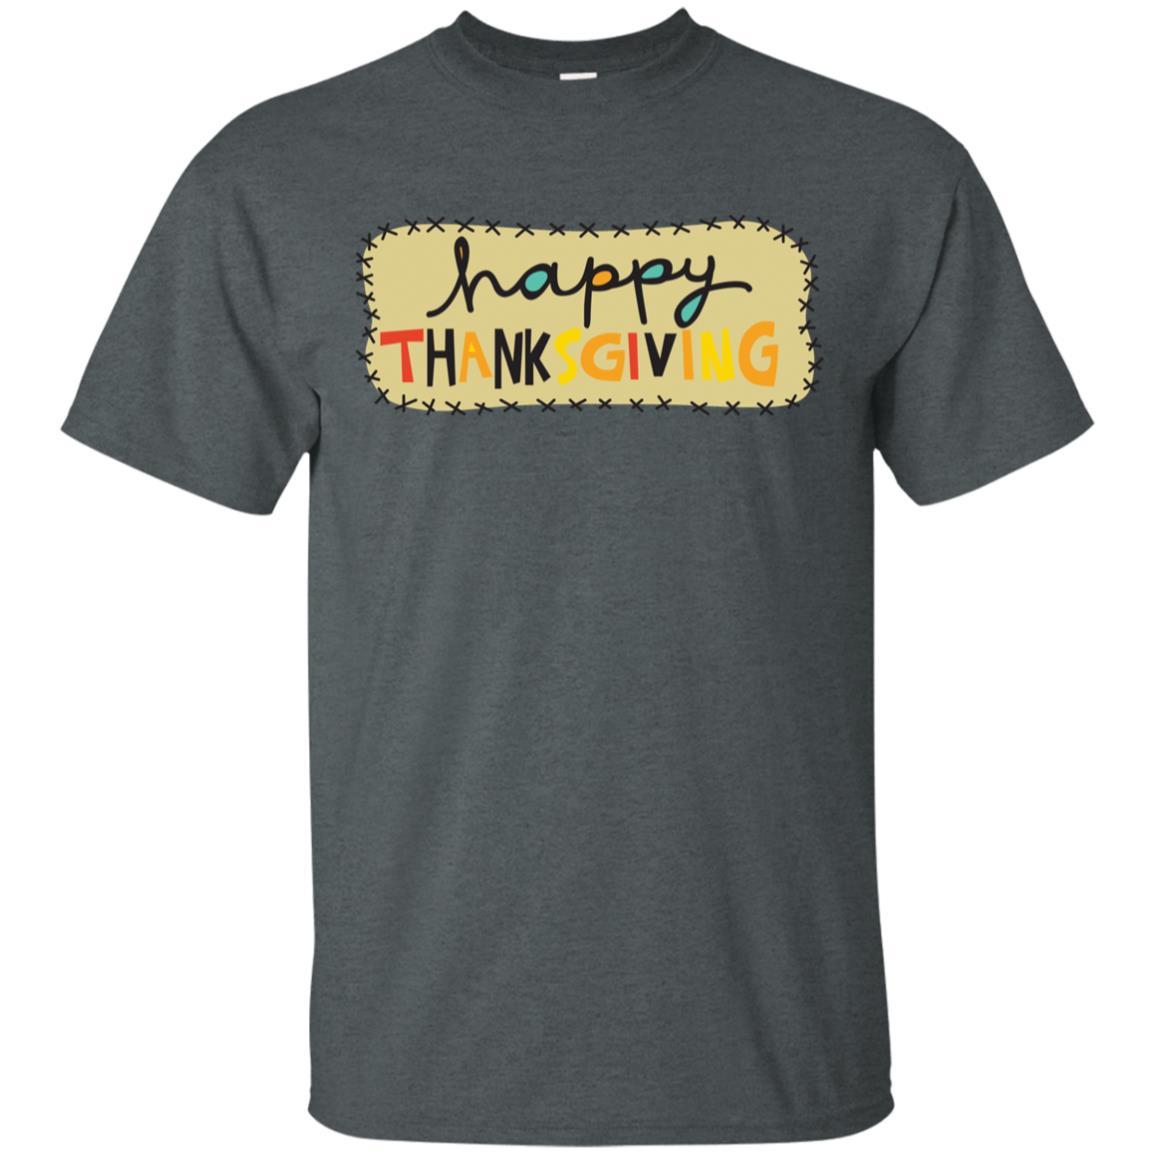 Happy Thanksgiving Tee Happy Thanksgiving -7 Unisex Short Sleeve